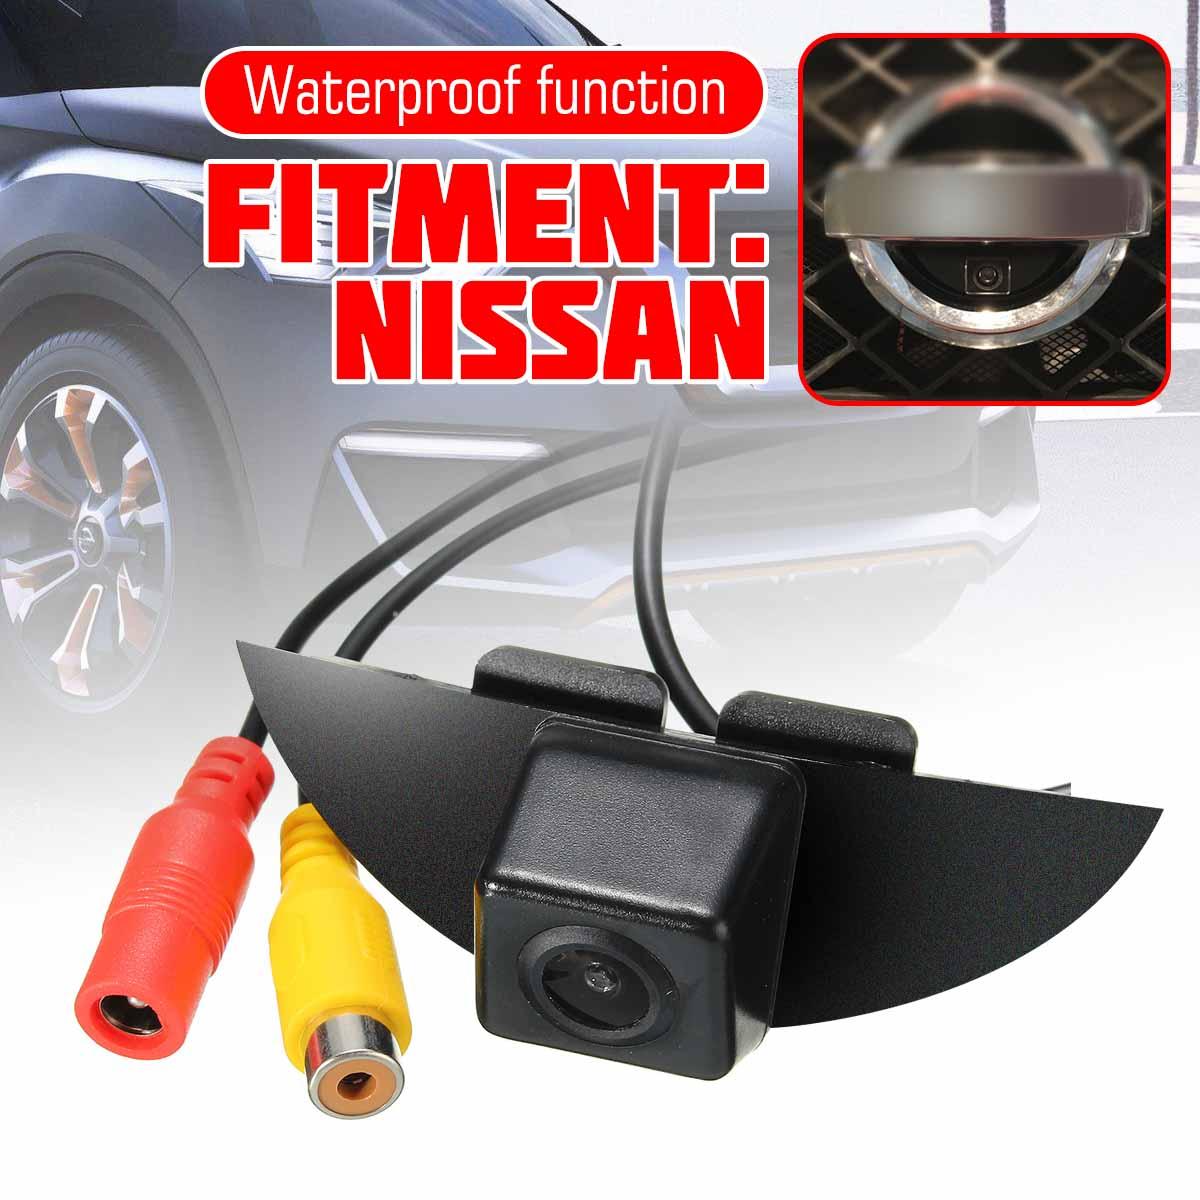 CCD Car Vehicle Front View Camera Logo IP68 For Nissan X-Trail Tiida Qashqai Livina Fairlady Pulsar Cube Armada Frontier Murano